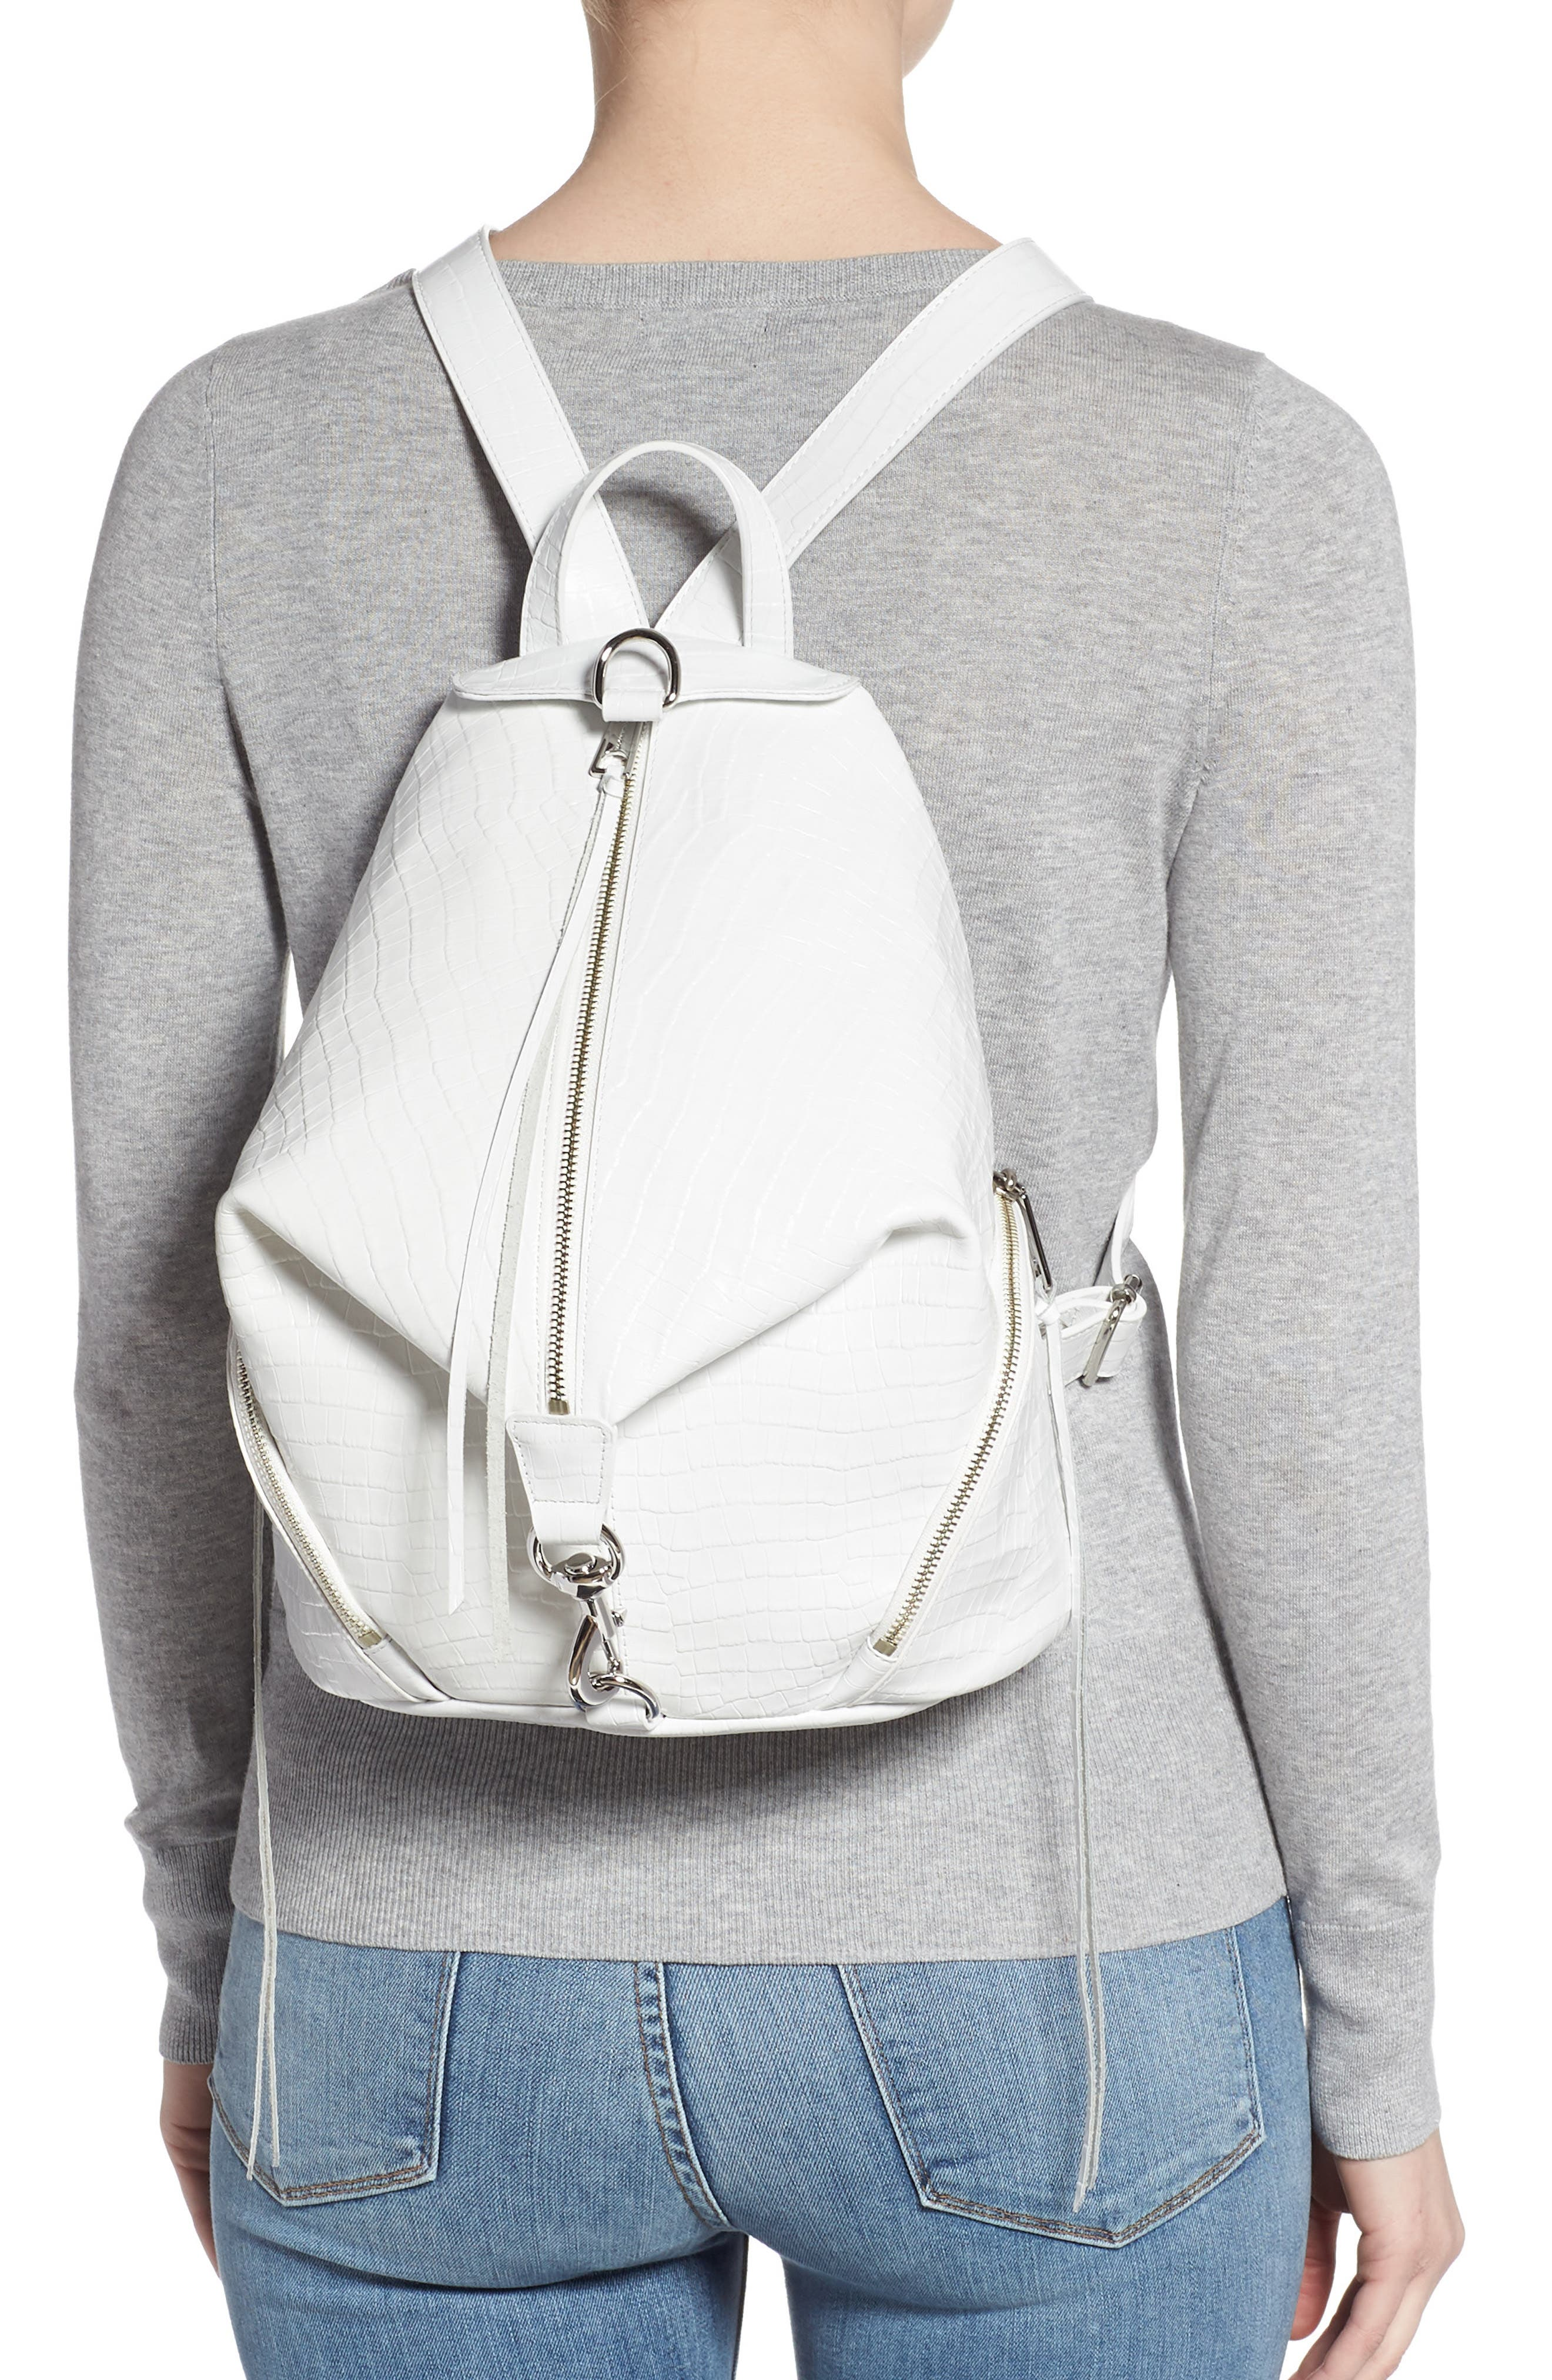 REBECCA MINKOFF, Julian Croc Embossed Leather Backpack, Alternate thumbnail 2, color, OPTIC WHITE